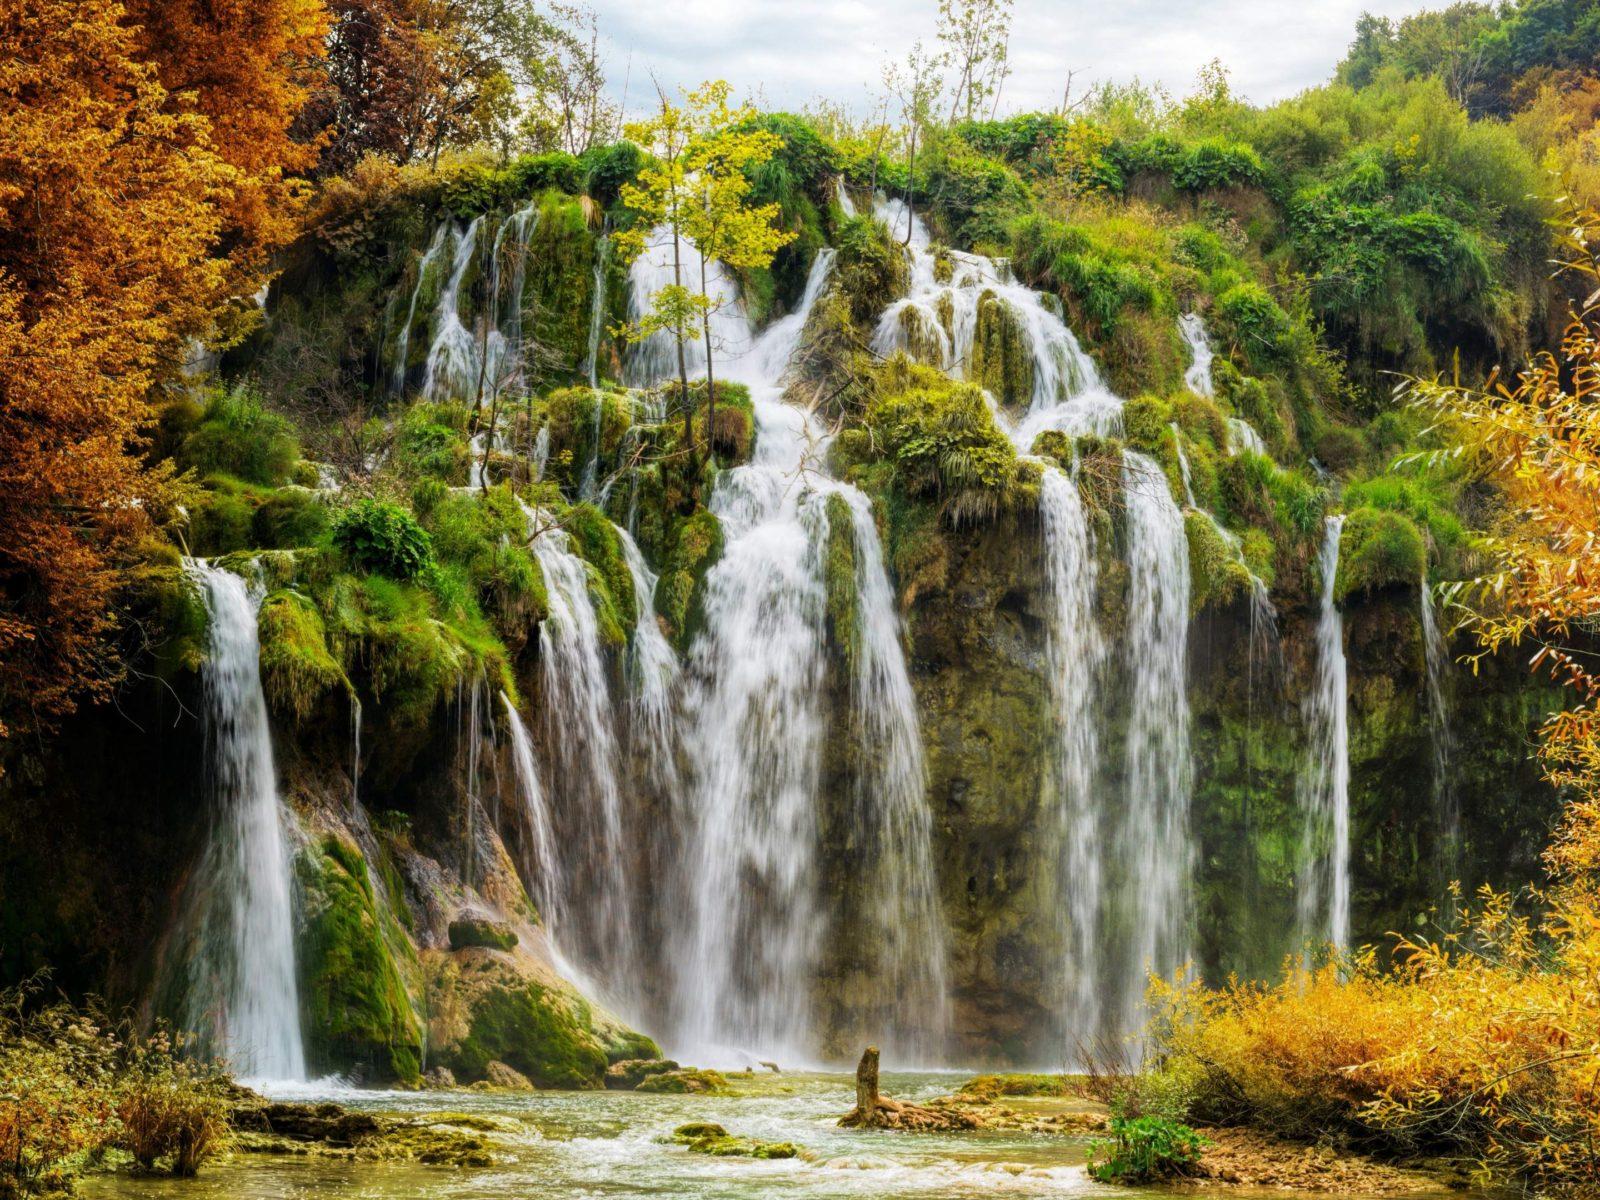 Niagara Falls Hd Wallpaper For Desktop Plitvice National Park Croatia Autumn Scenery Hd Wallpaper